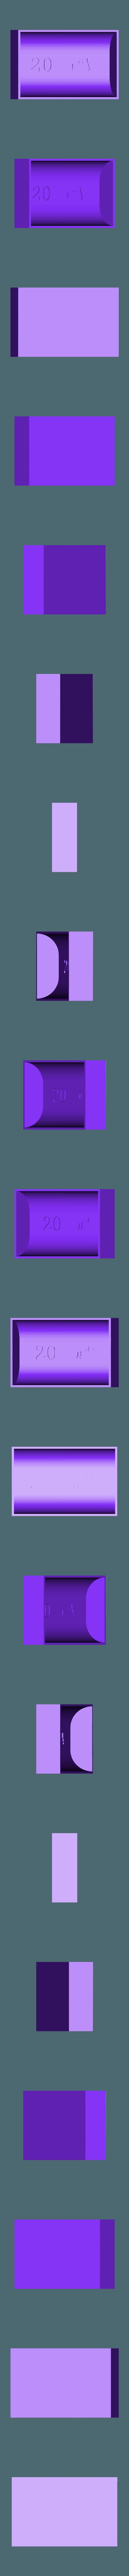 MachiKoro_5_Anniversary_Twenties.stl Download free STL file Machi Koro 5th Anniversary with Expansions • Model to 3D print, Hardcore3D